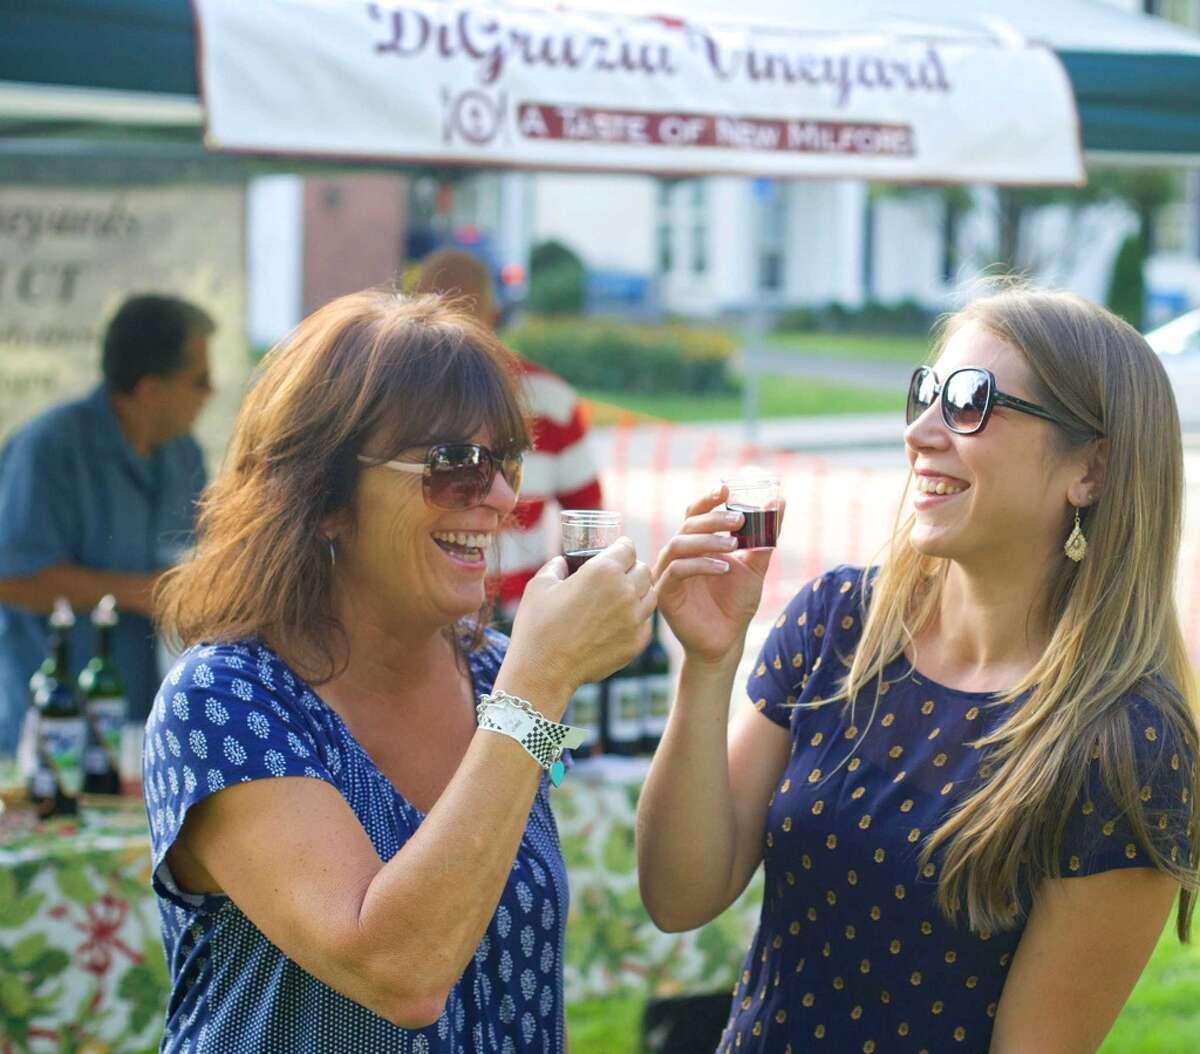 DiGrazia Vineyard - Brookfield 4.5 stars on Yelp | 53 reviewsConsensus: Nice wine, lackluster setting